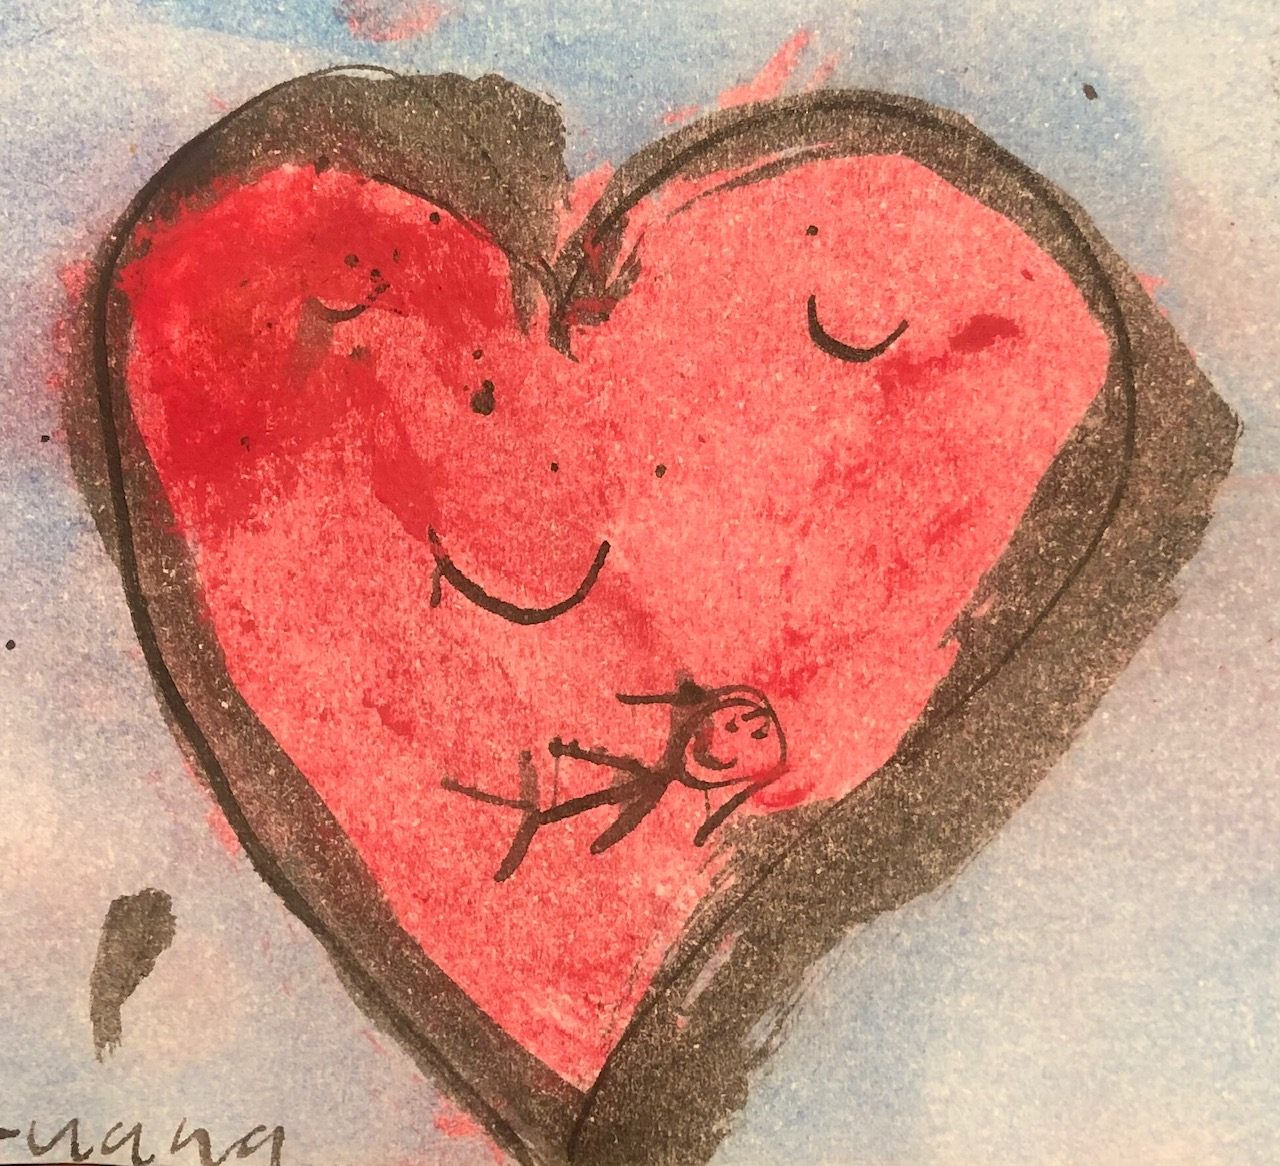 Jemanden_im_Herzen_tragen.jpg